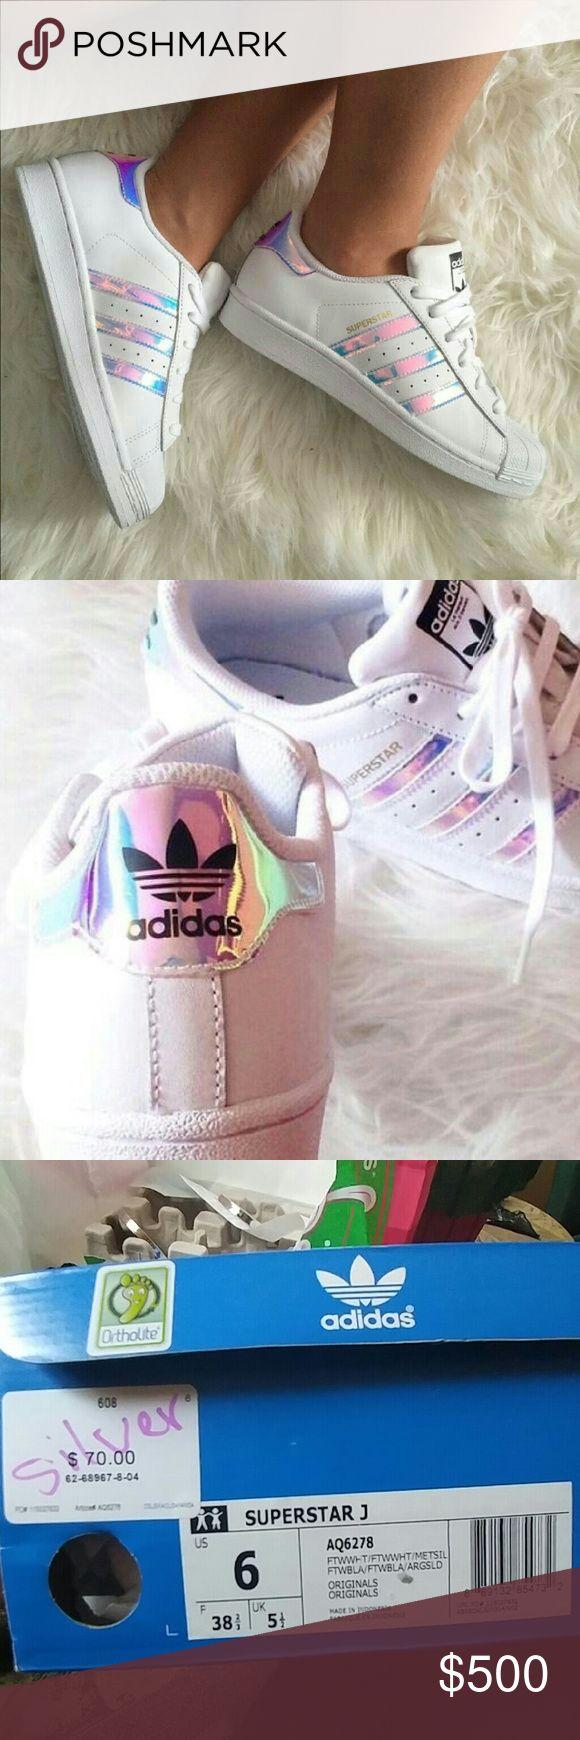 kids black adidas superstar size 8